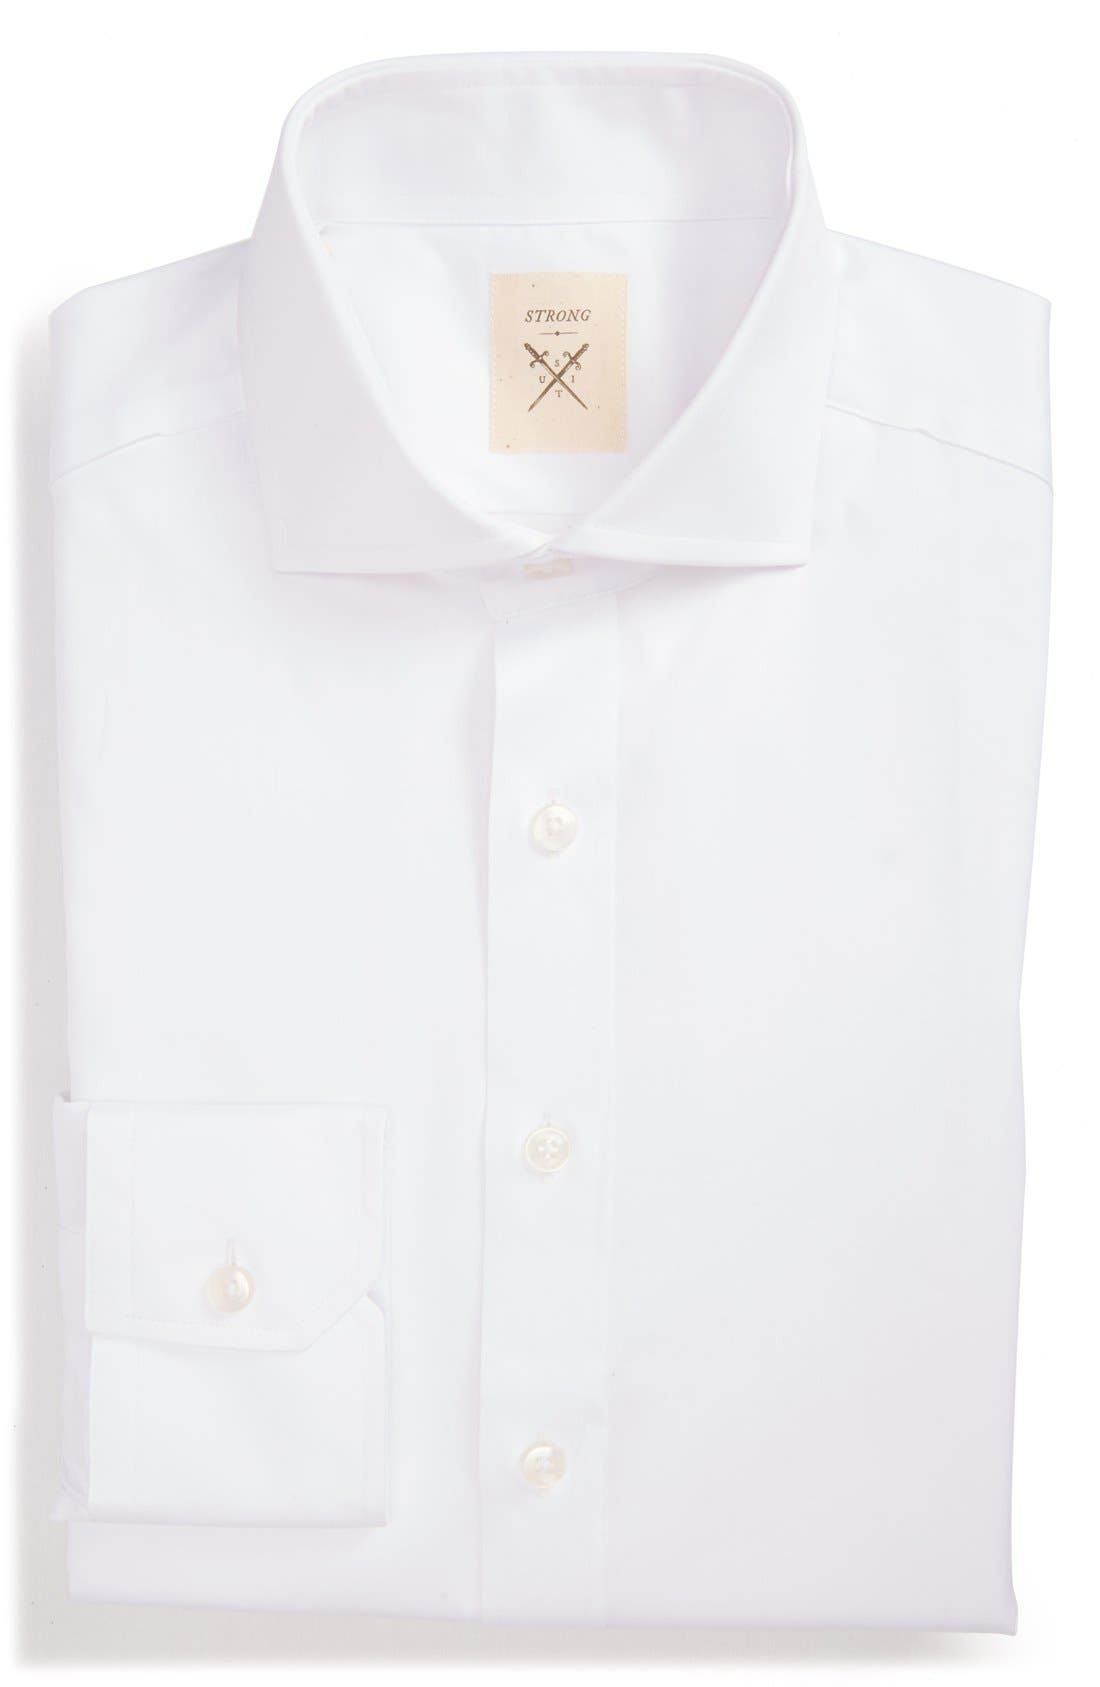 Trim Fit Solid Twill Dress Shirt,                             Main thumbnail 1, color,                             100